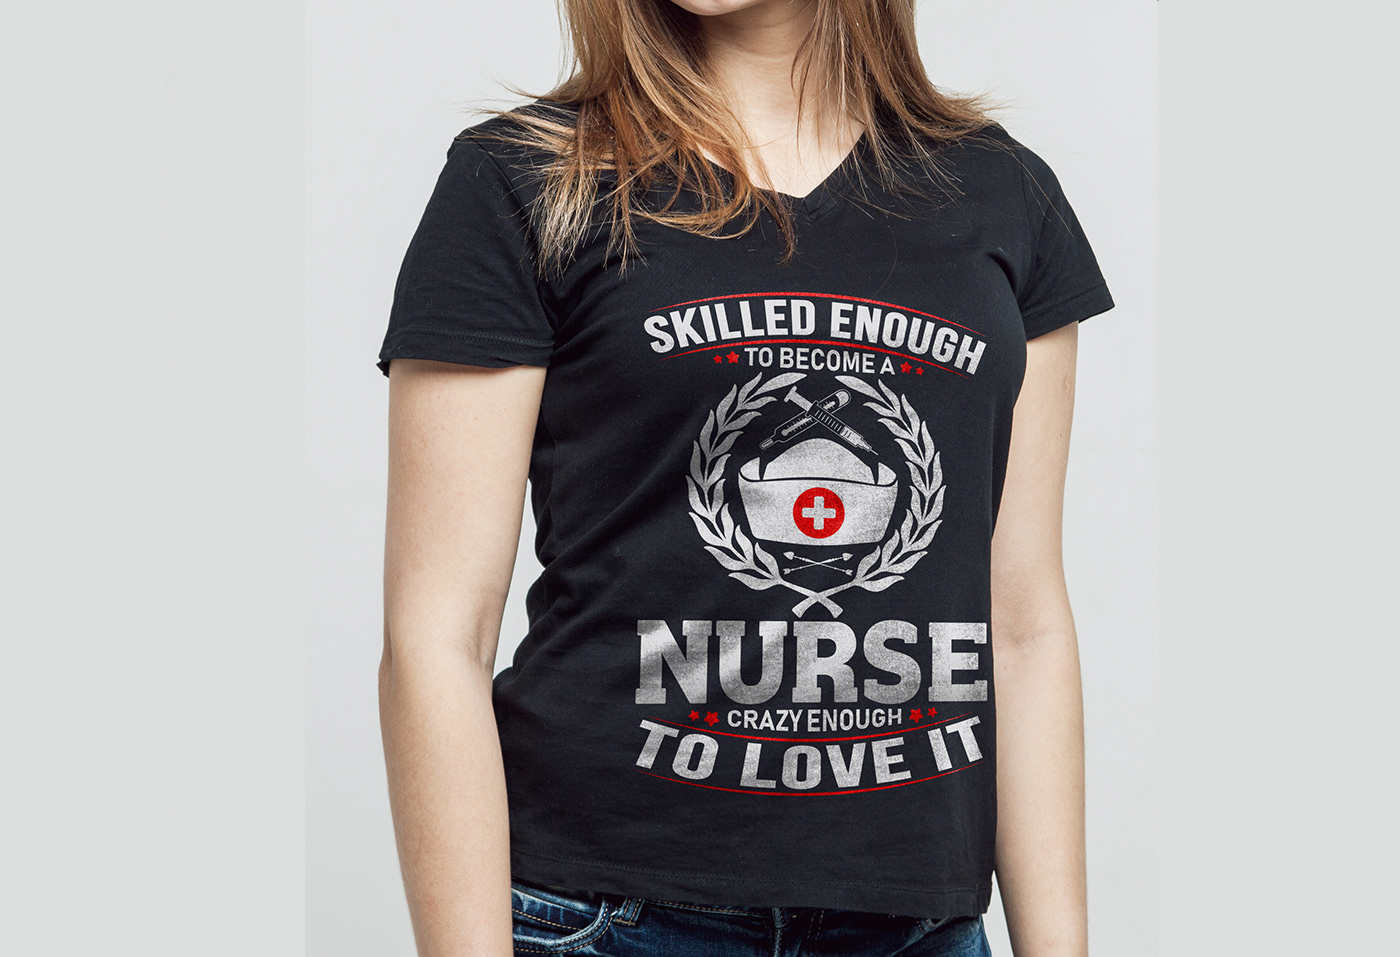 Image may contain: person, t-shirt and active shirt